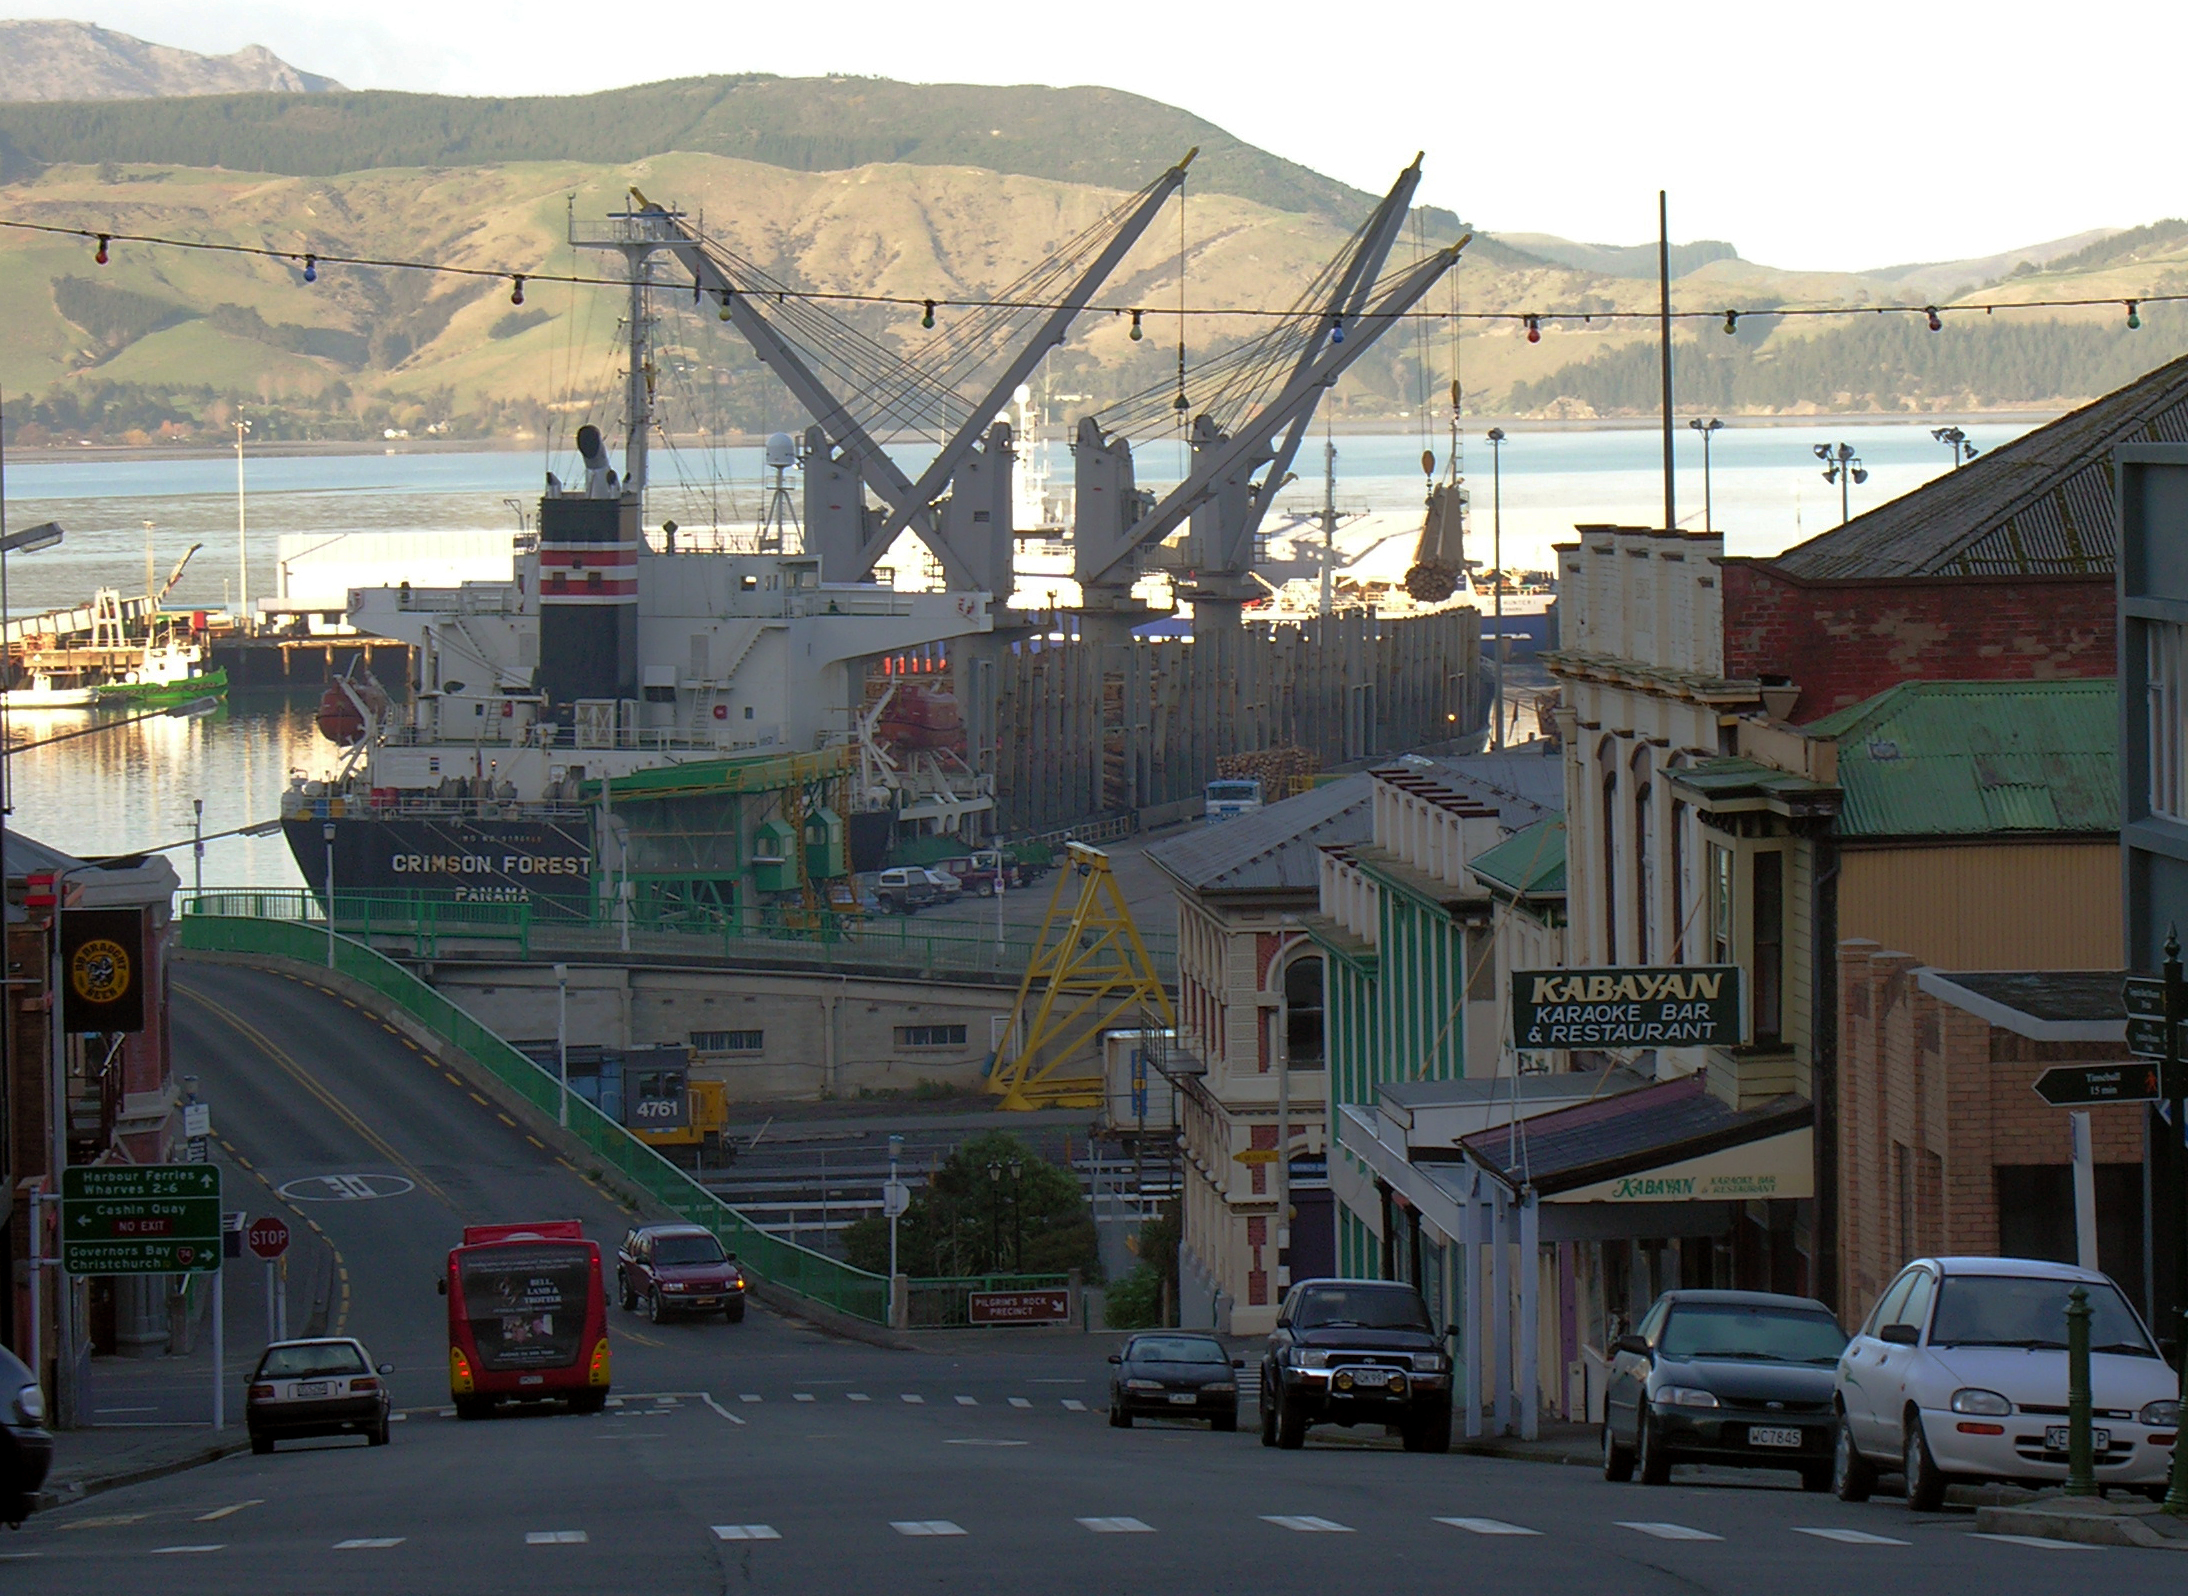 Lyttelton Port of Christchurch